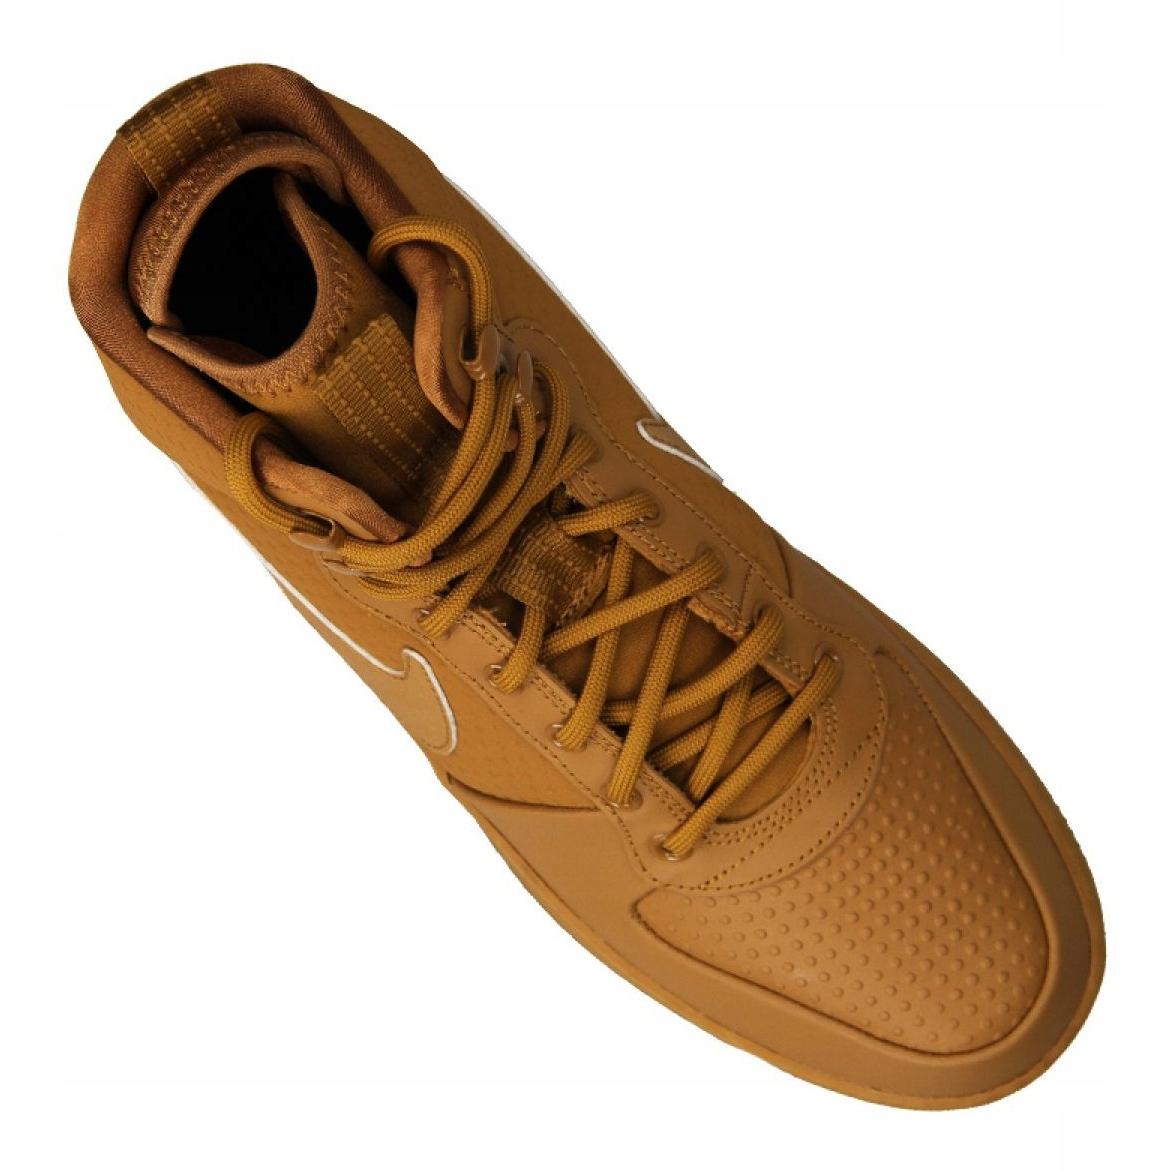 Sapatilhas Nike Ebernon Mid Winter M AQ8754 700 marrom